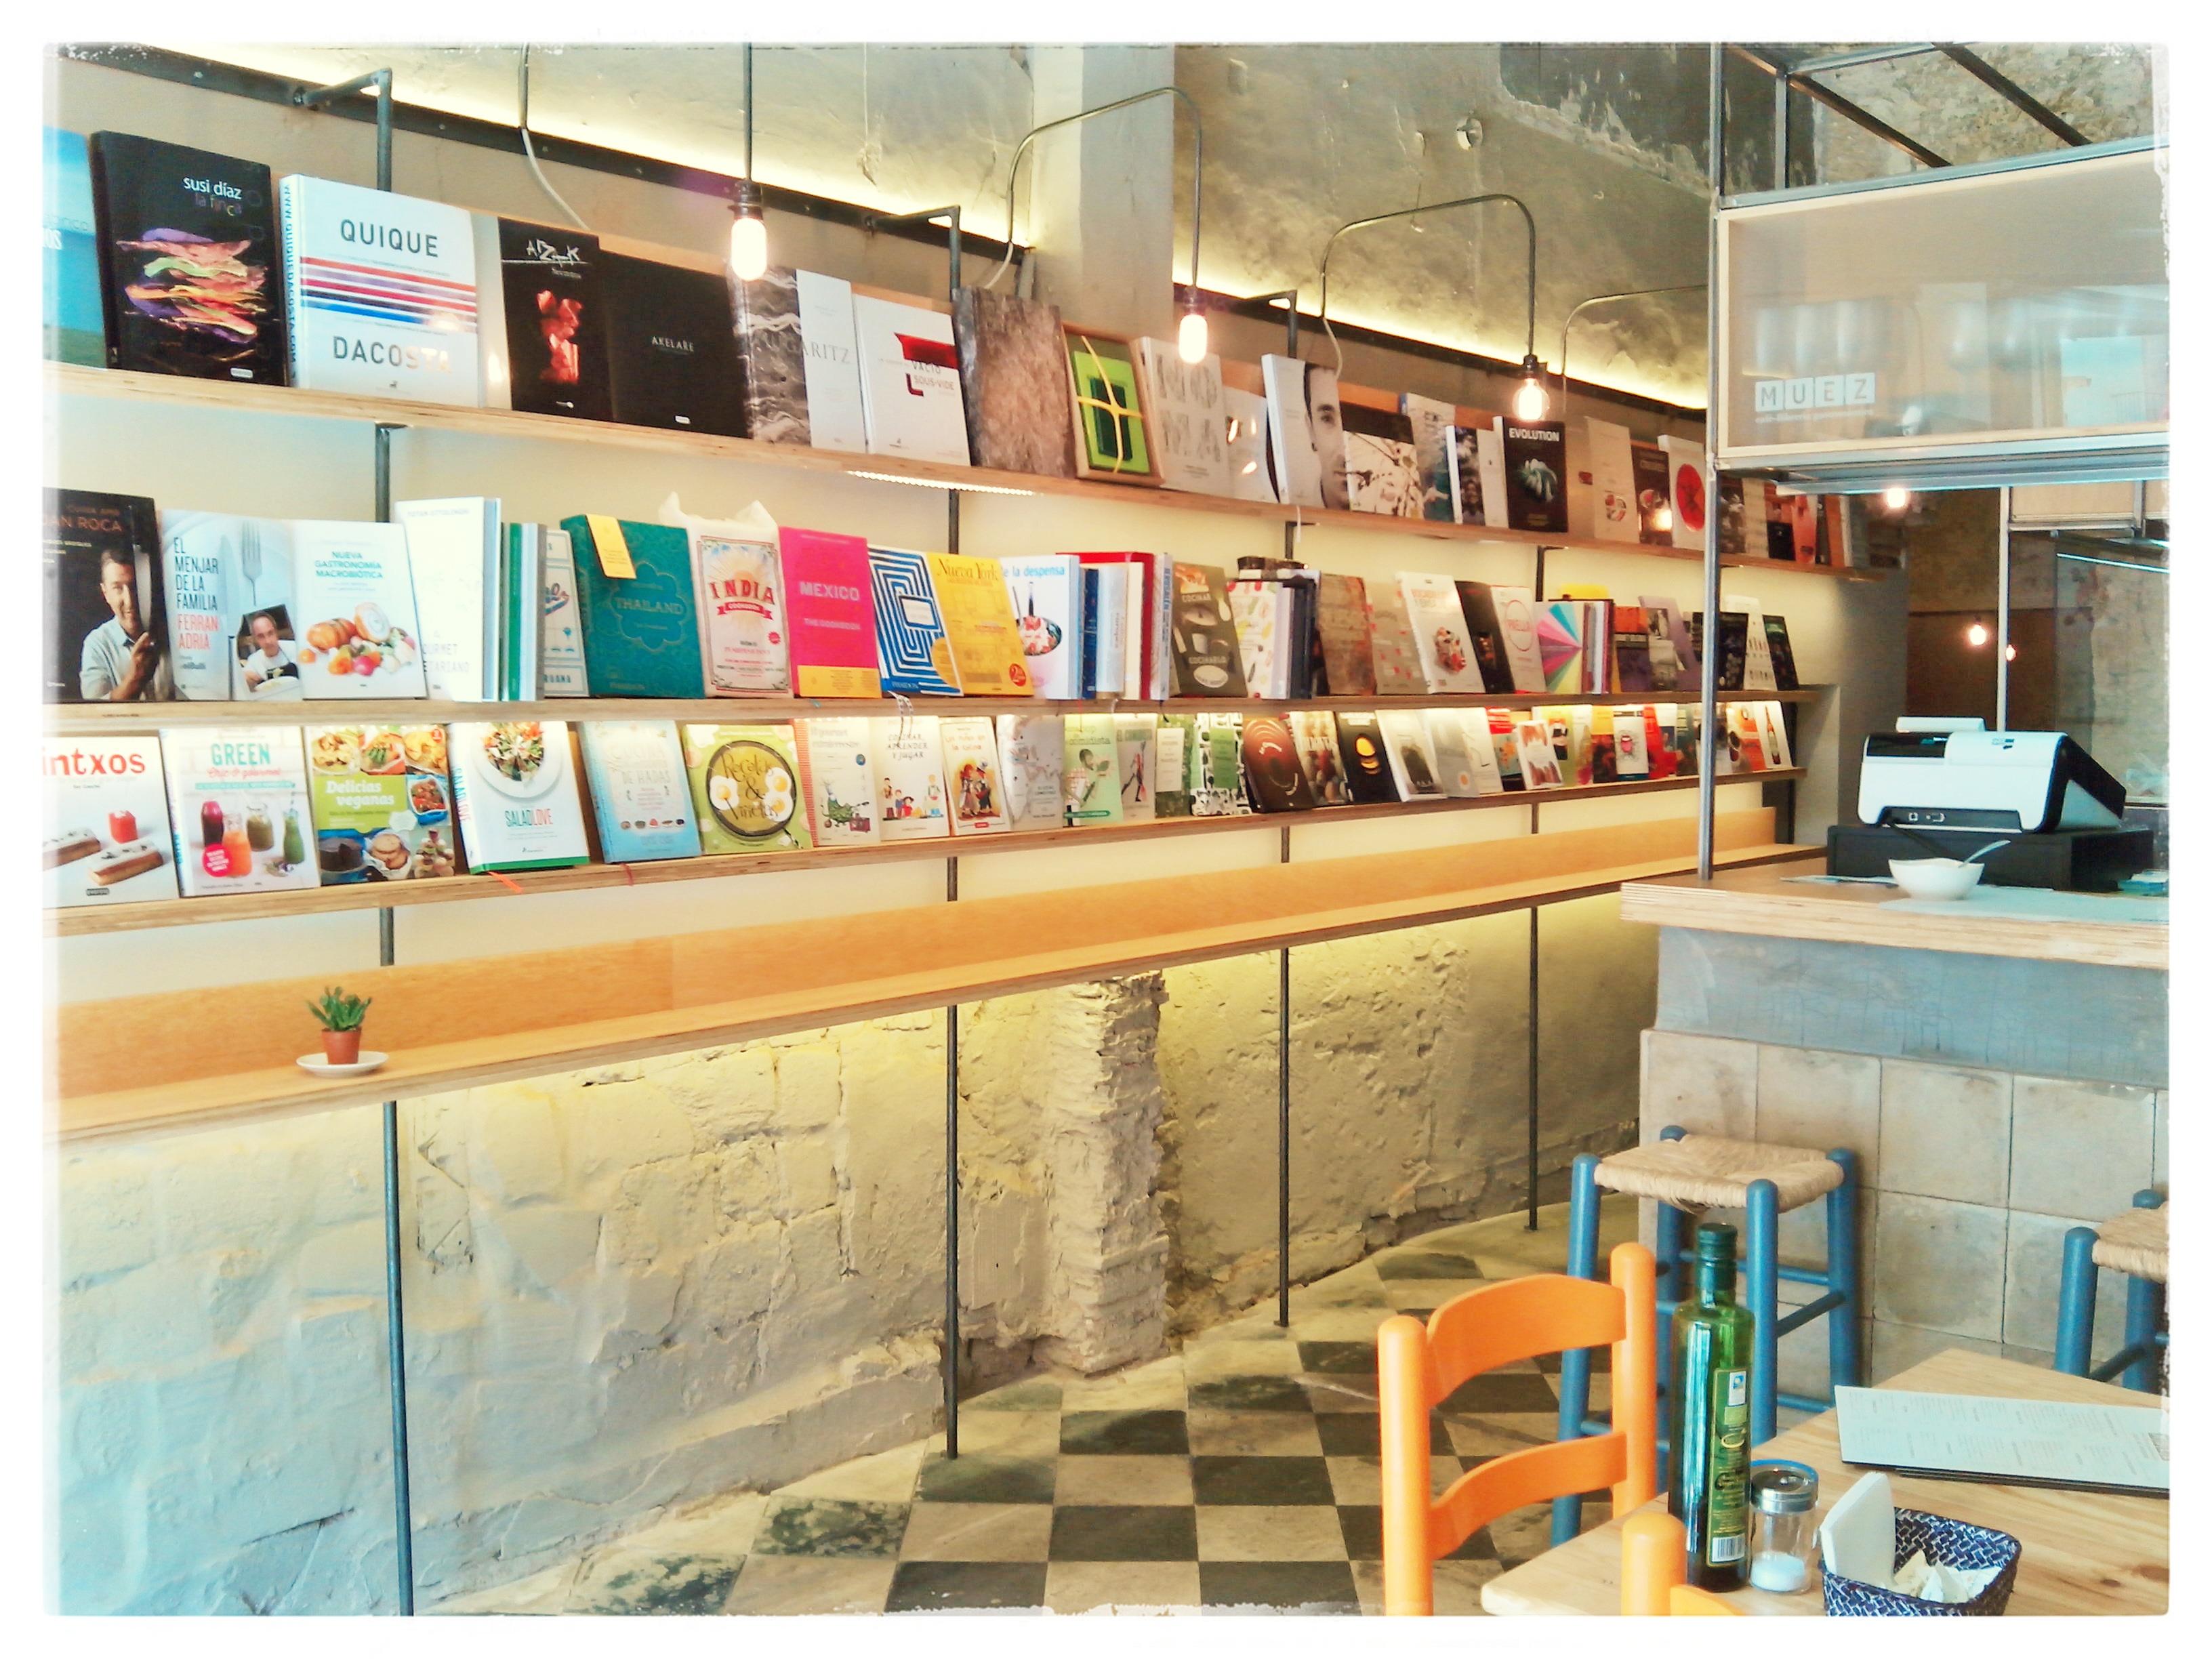 Libreria gastronómica